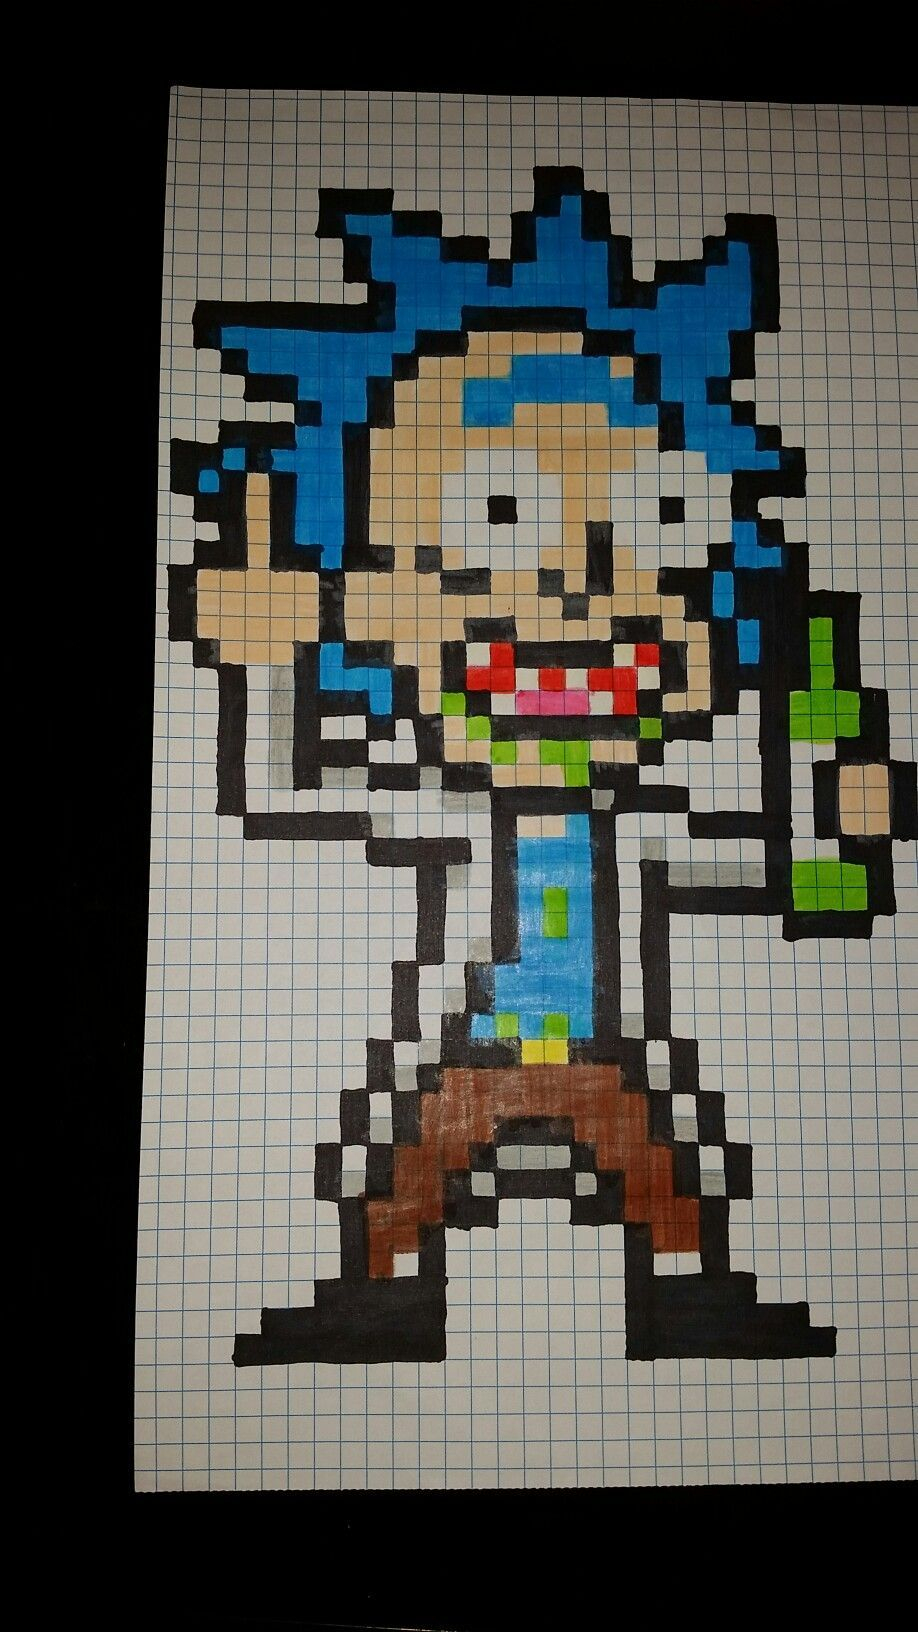 Rick Pixel Art #art #pixel #rick, 2020 | Minecraft Piksel à Pixel Jouet